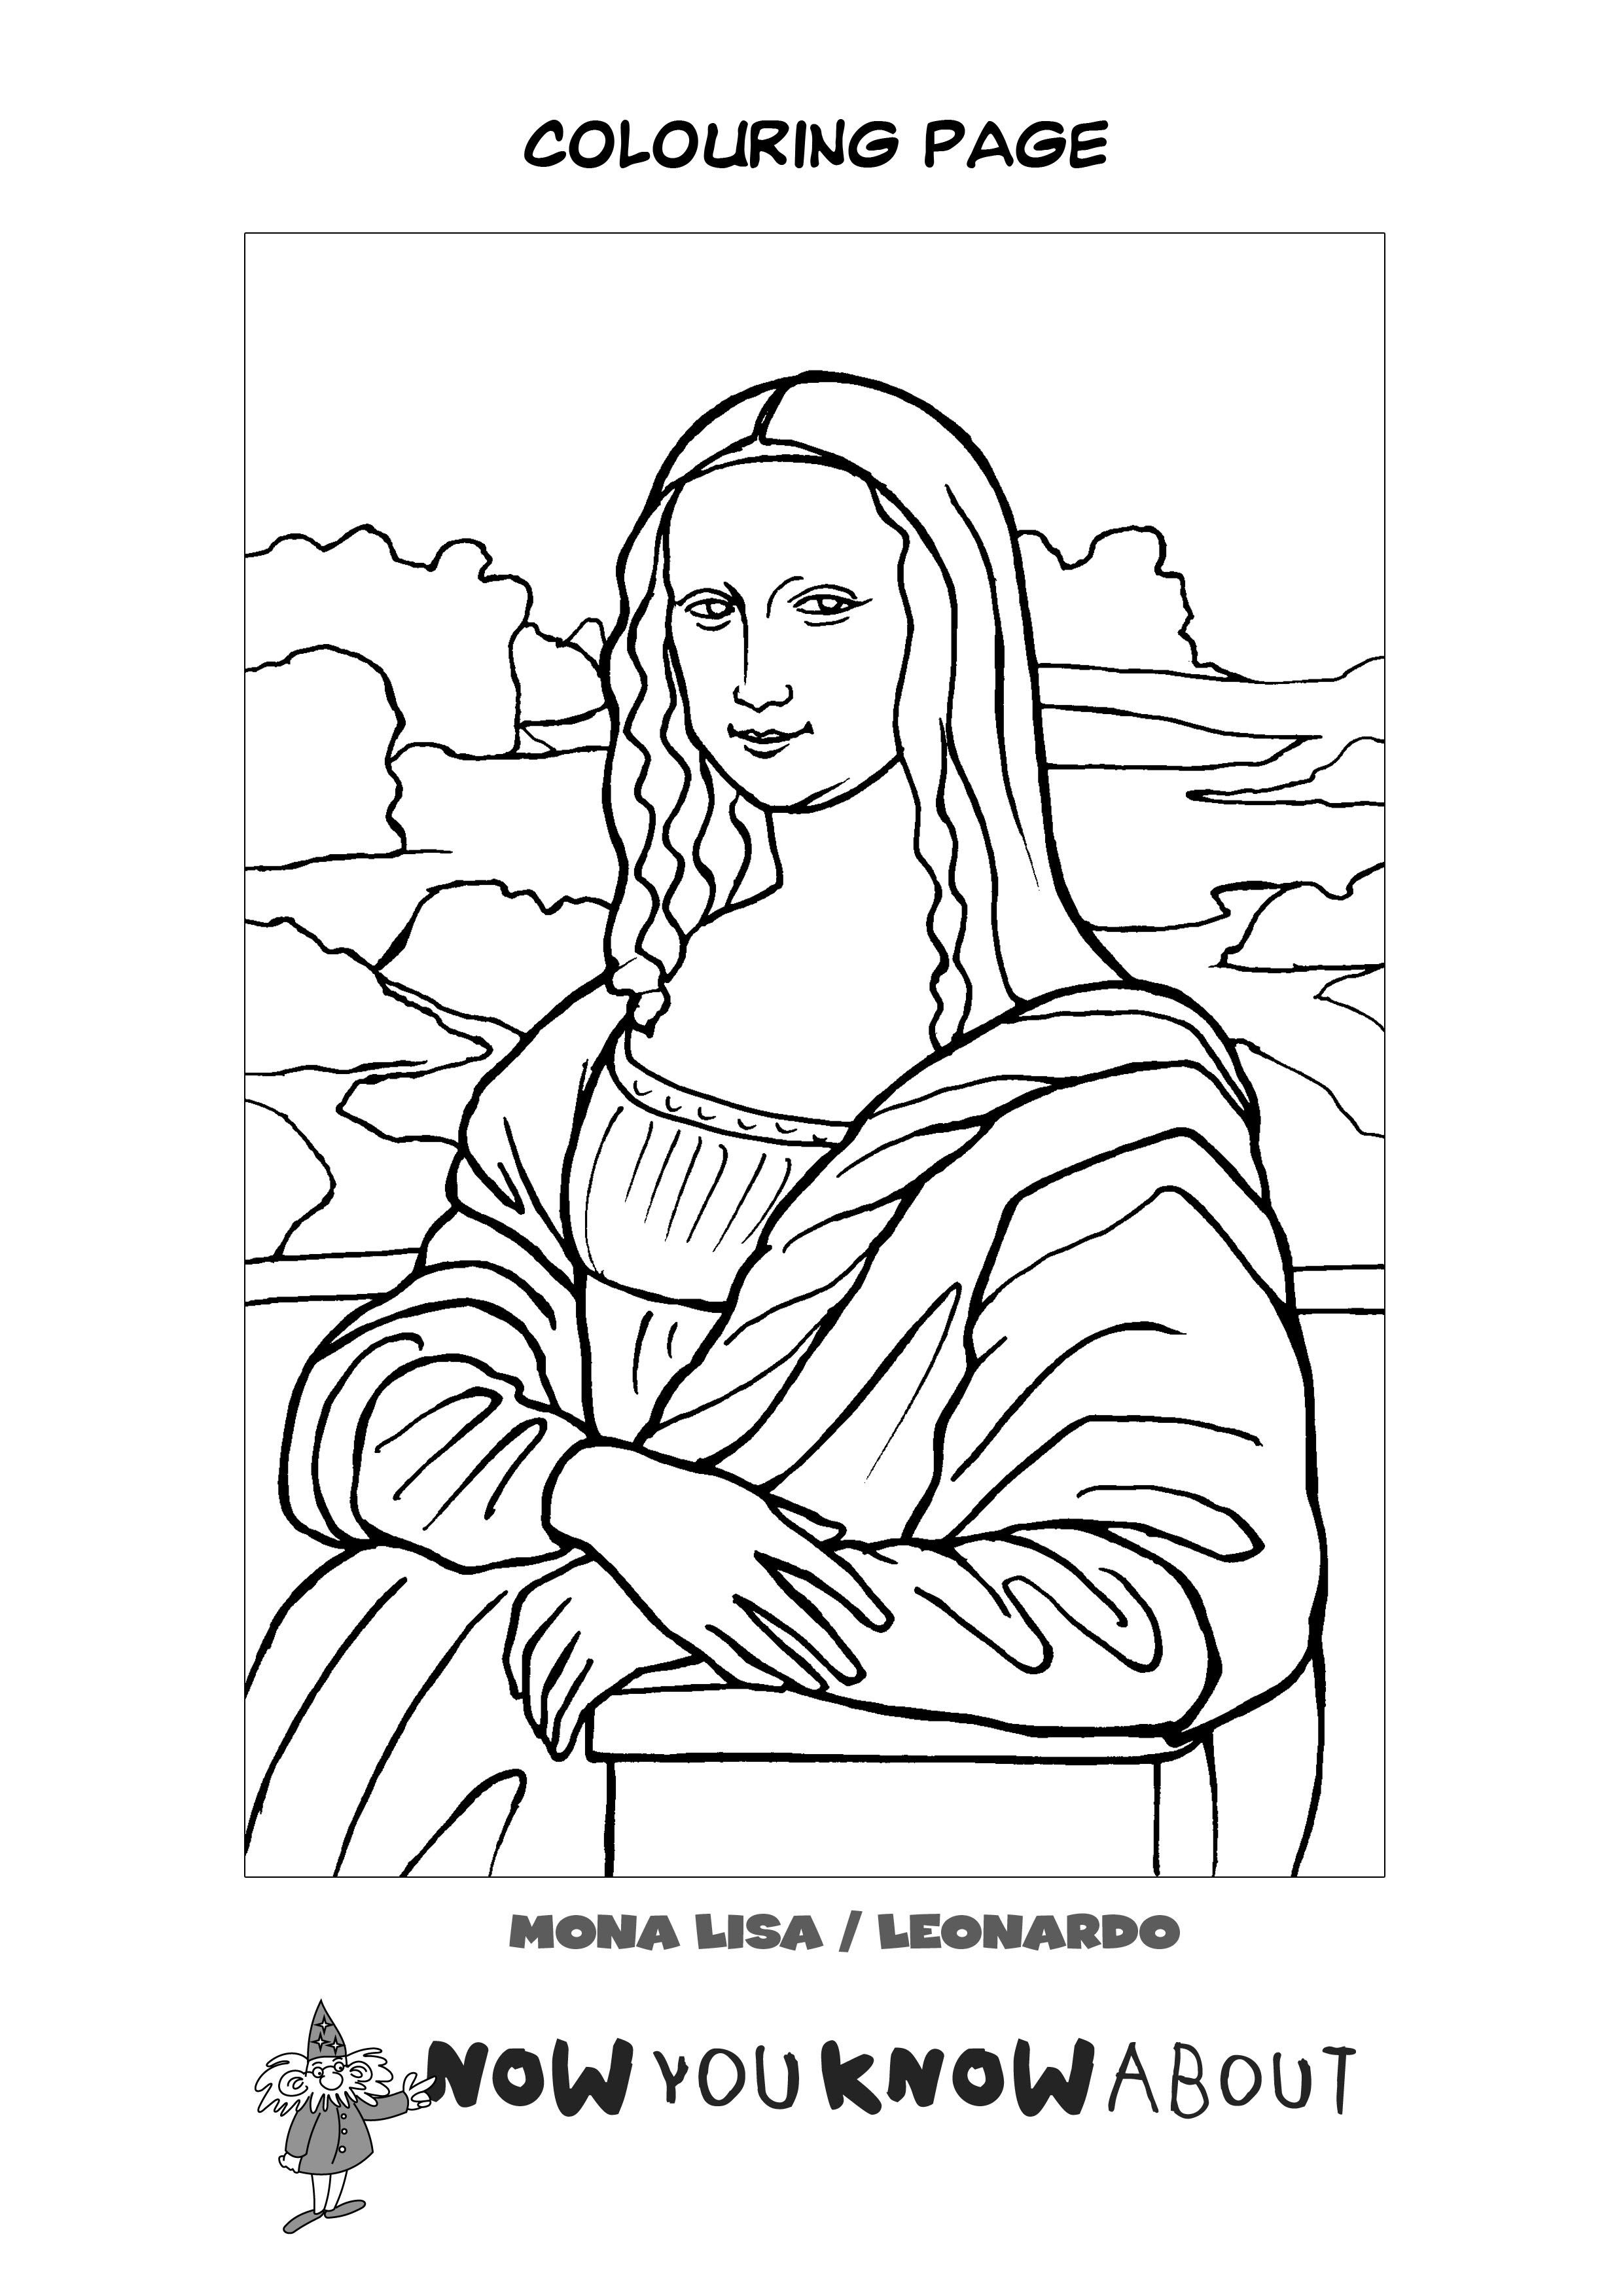 Watch the story of Leonardo da Vinci and then colour in